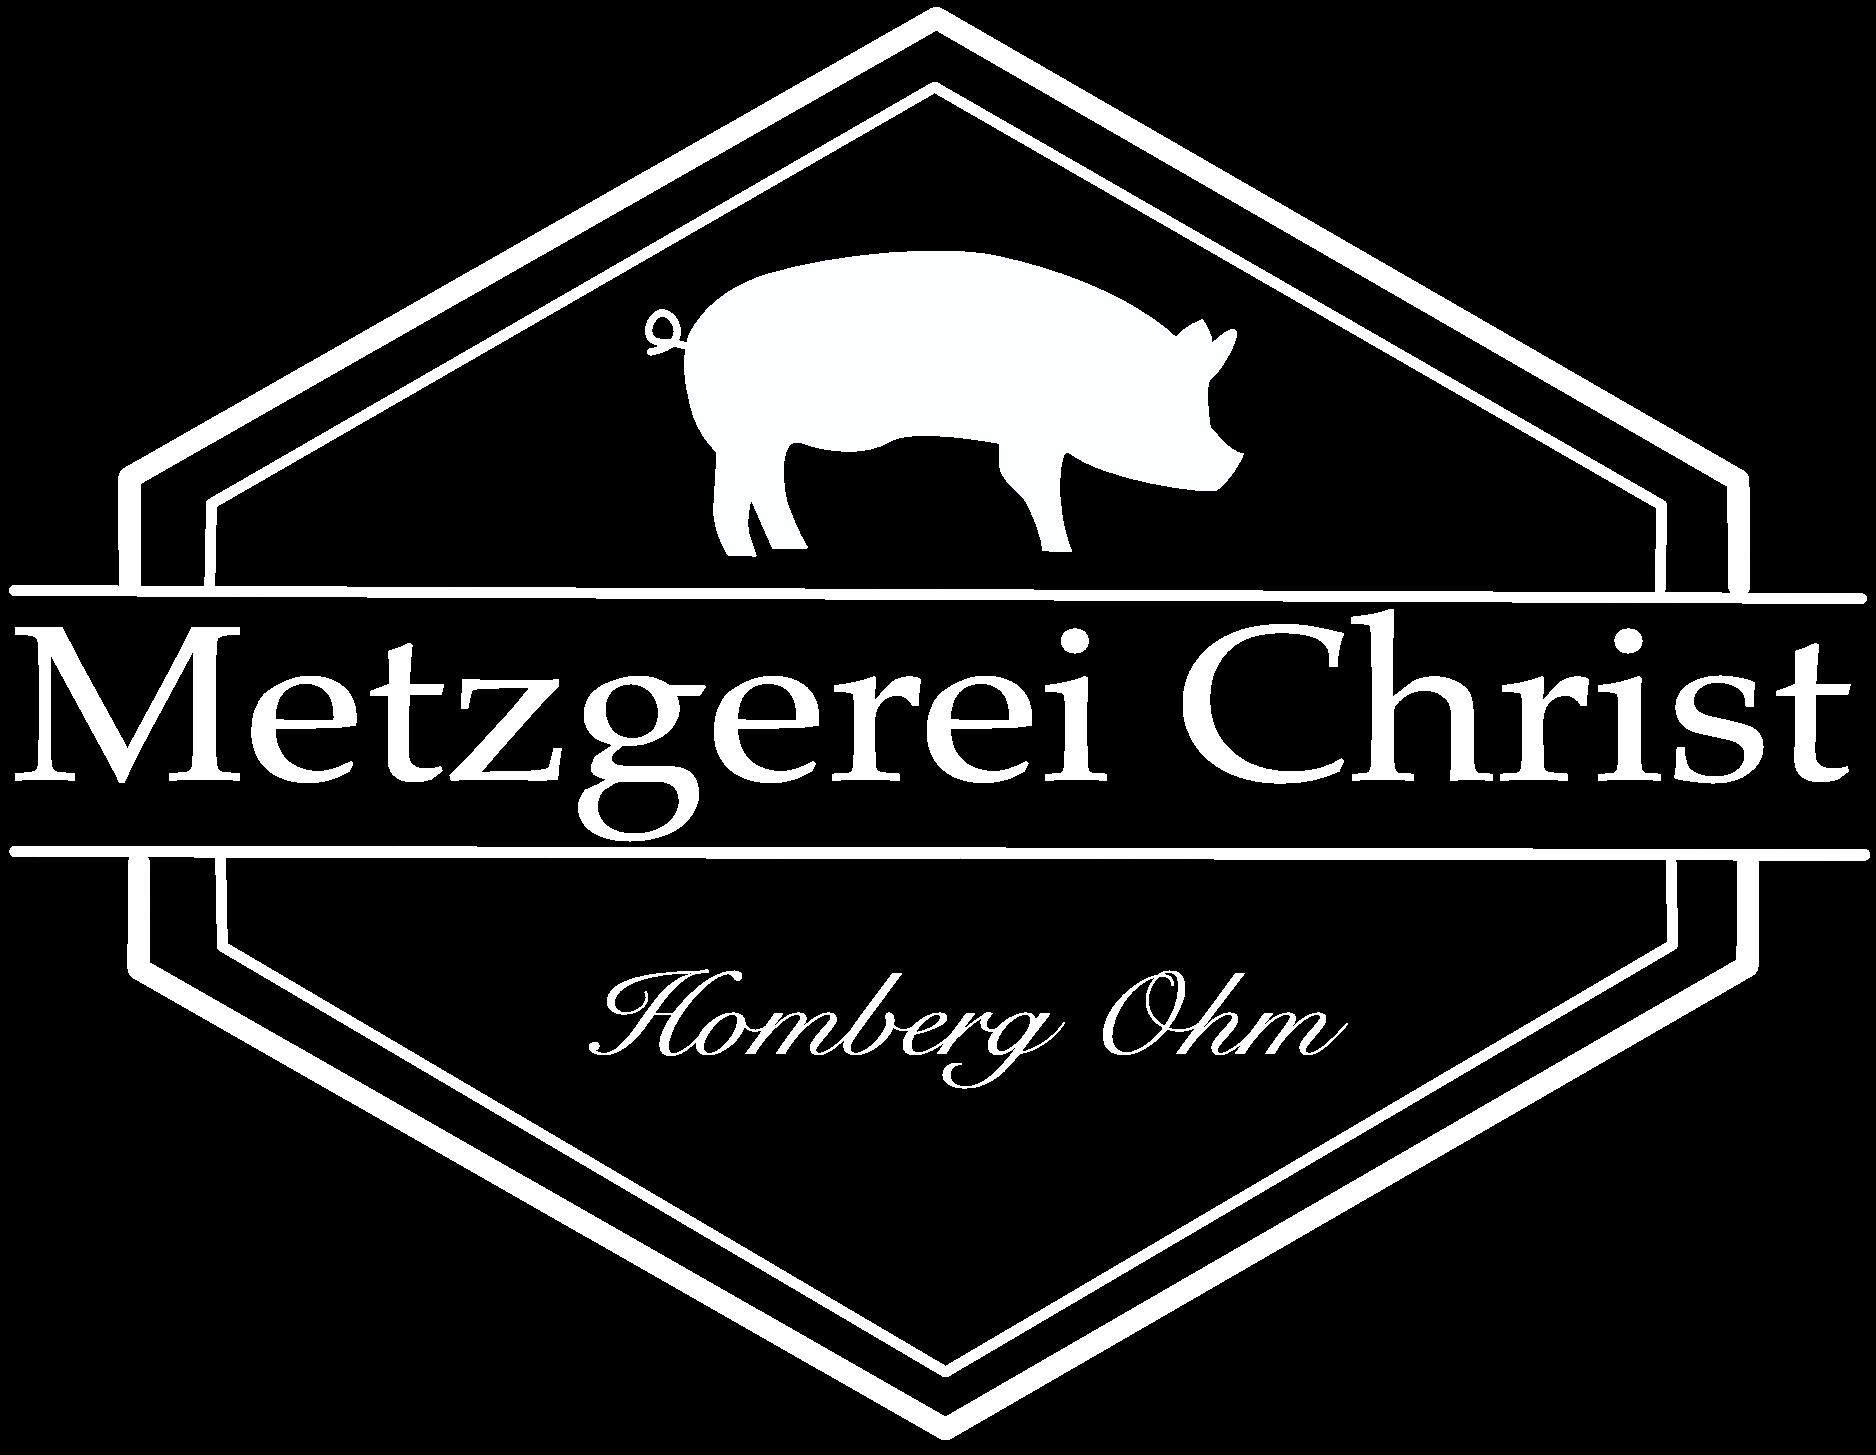 Metzgerei Christ